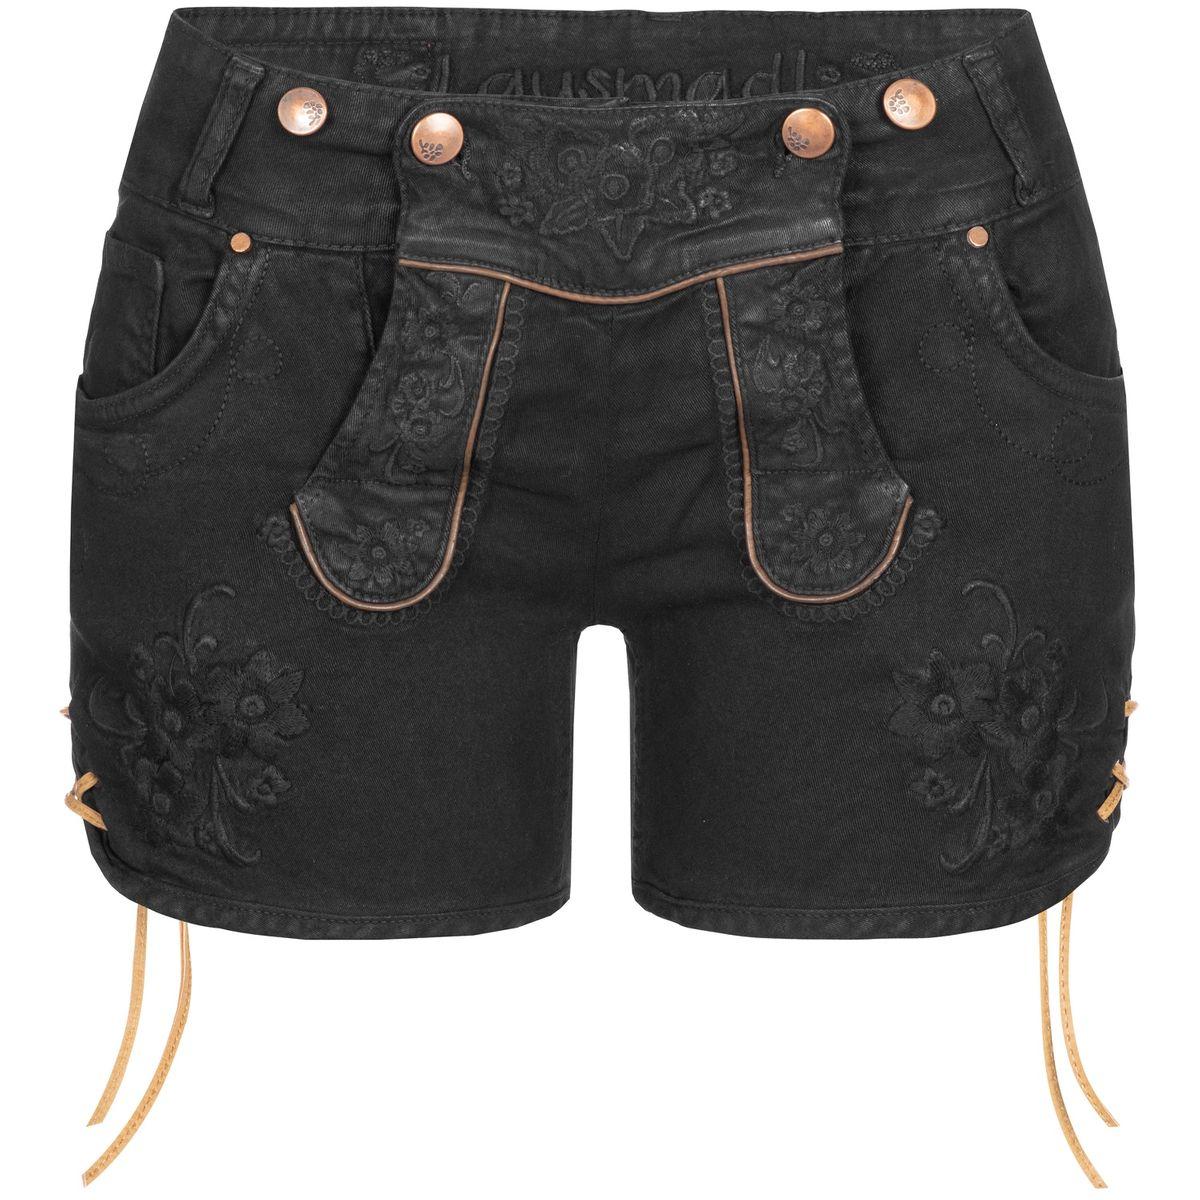 kurze Jeans-Lederhose Ovida in Schwarz von Hangowear